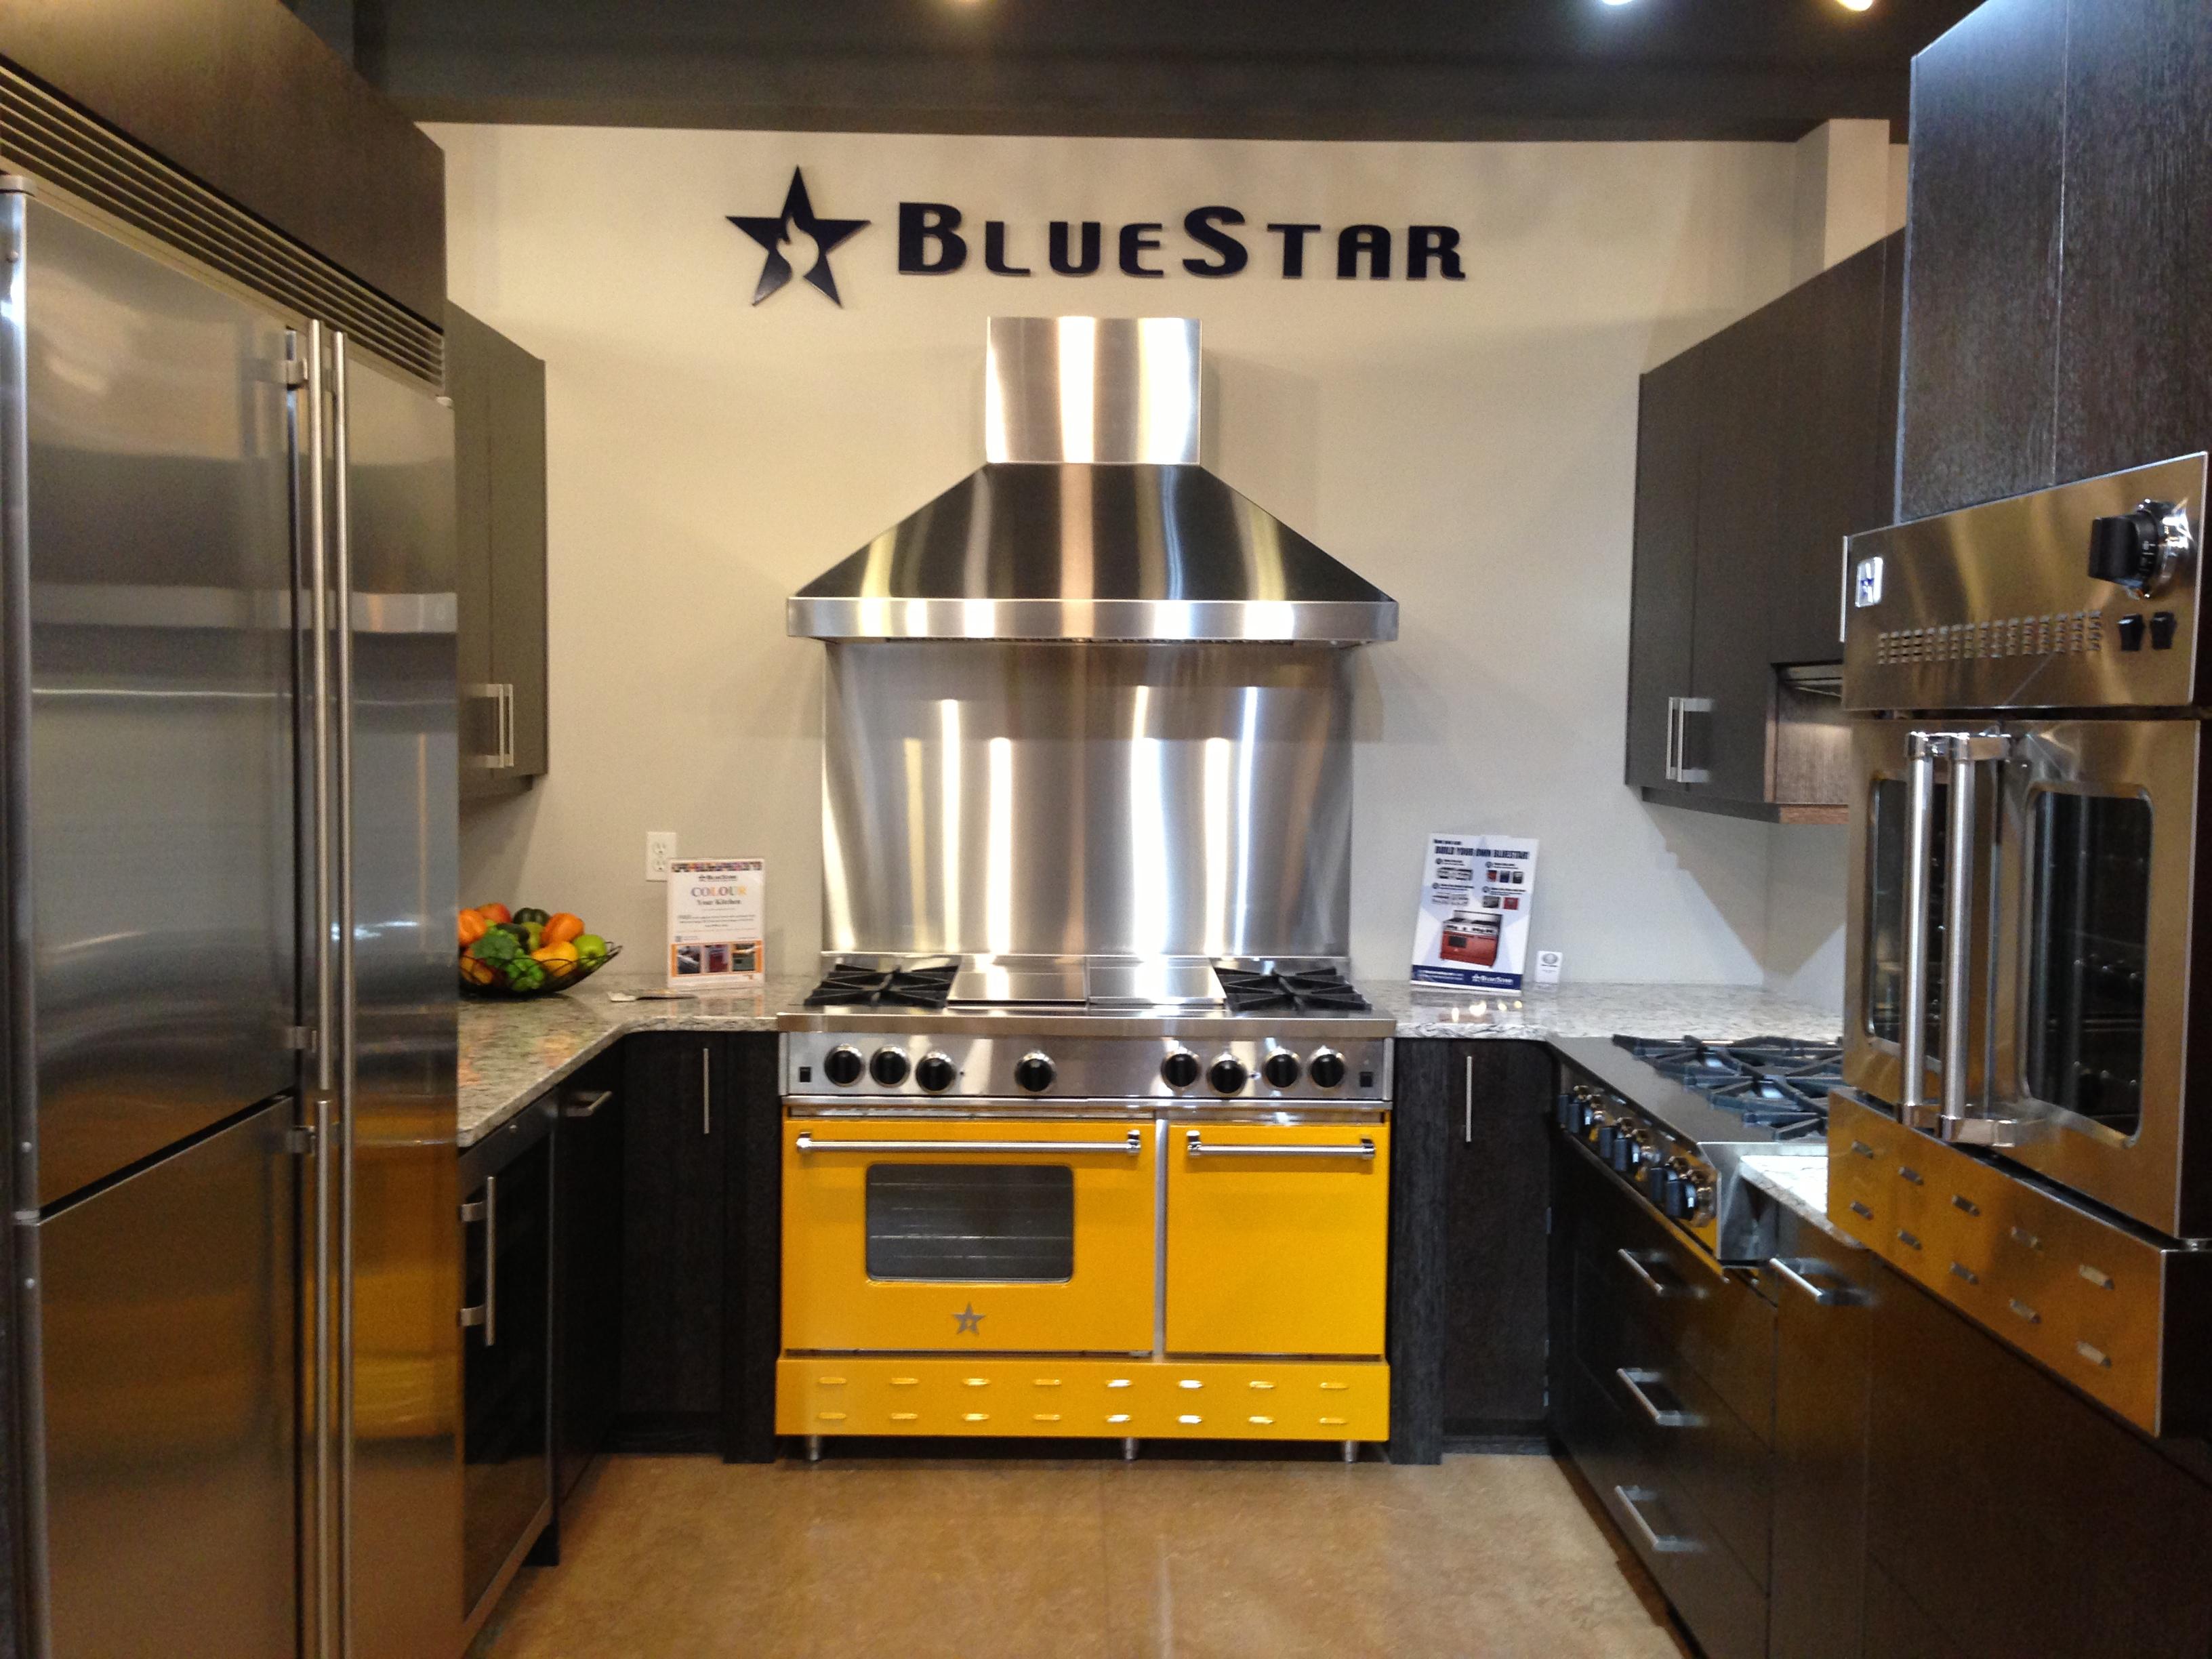 kitchen appliance store dish rack bluestar appliances now at avenue edmonton blue star home